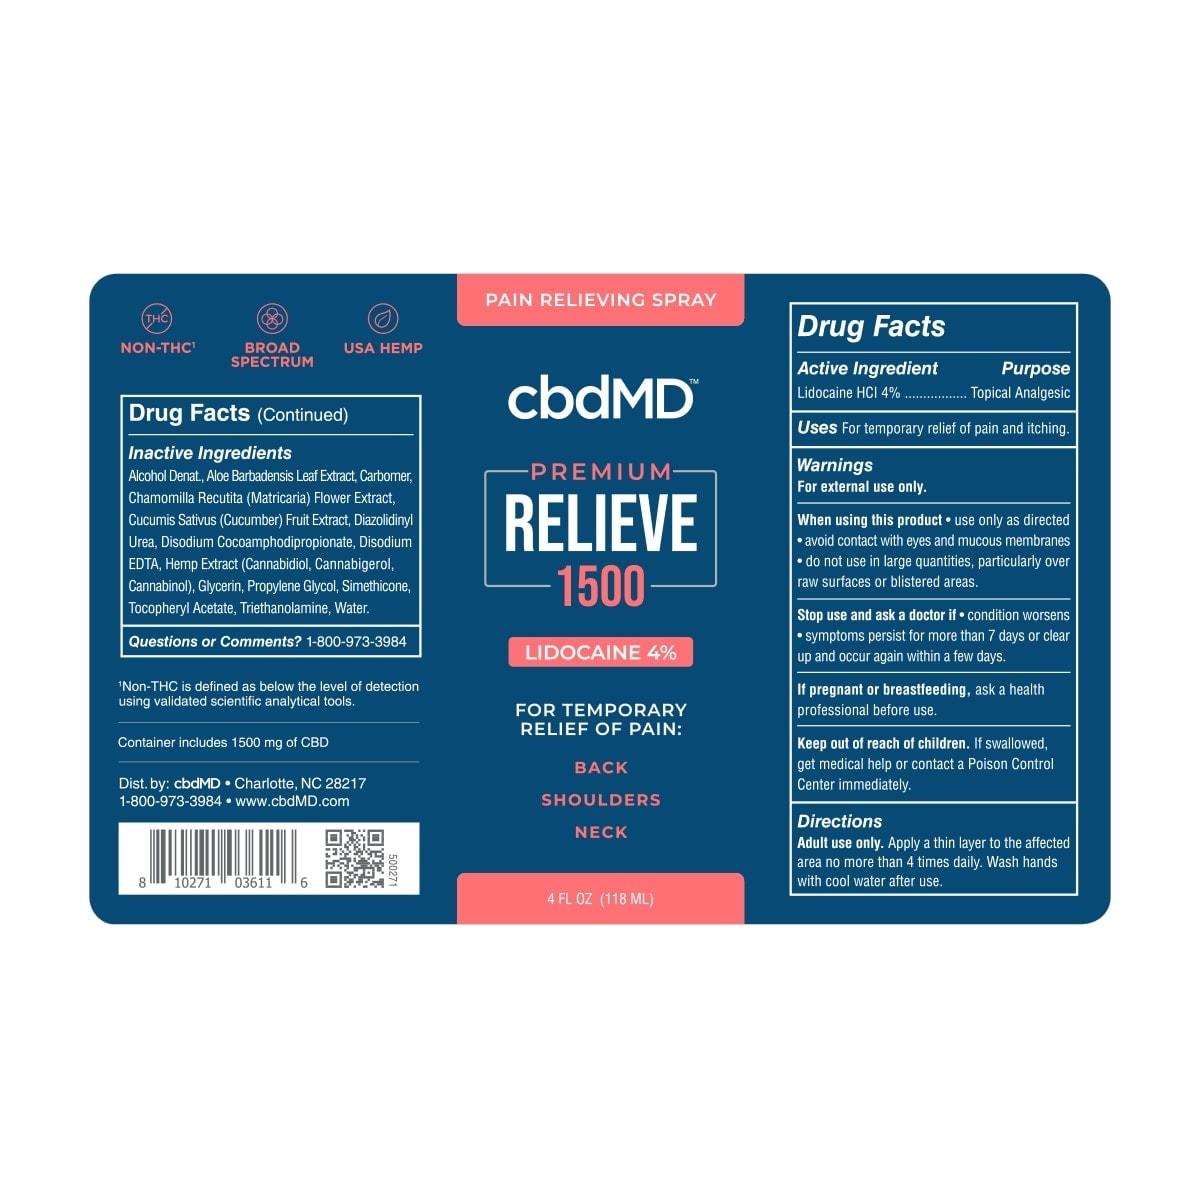 cbdMD, CBD Lidocaine Spray, Broad Spectrum THC-Free, 4oz, 1500mg of CBD3